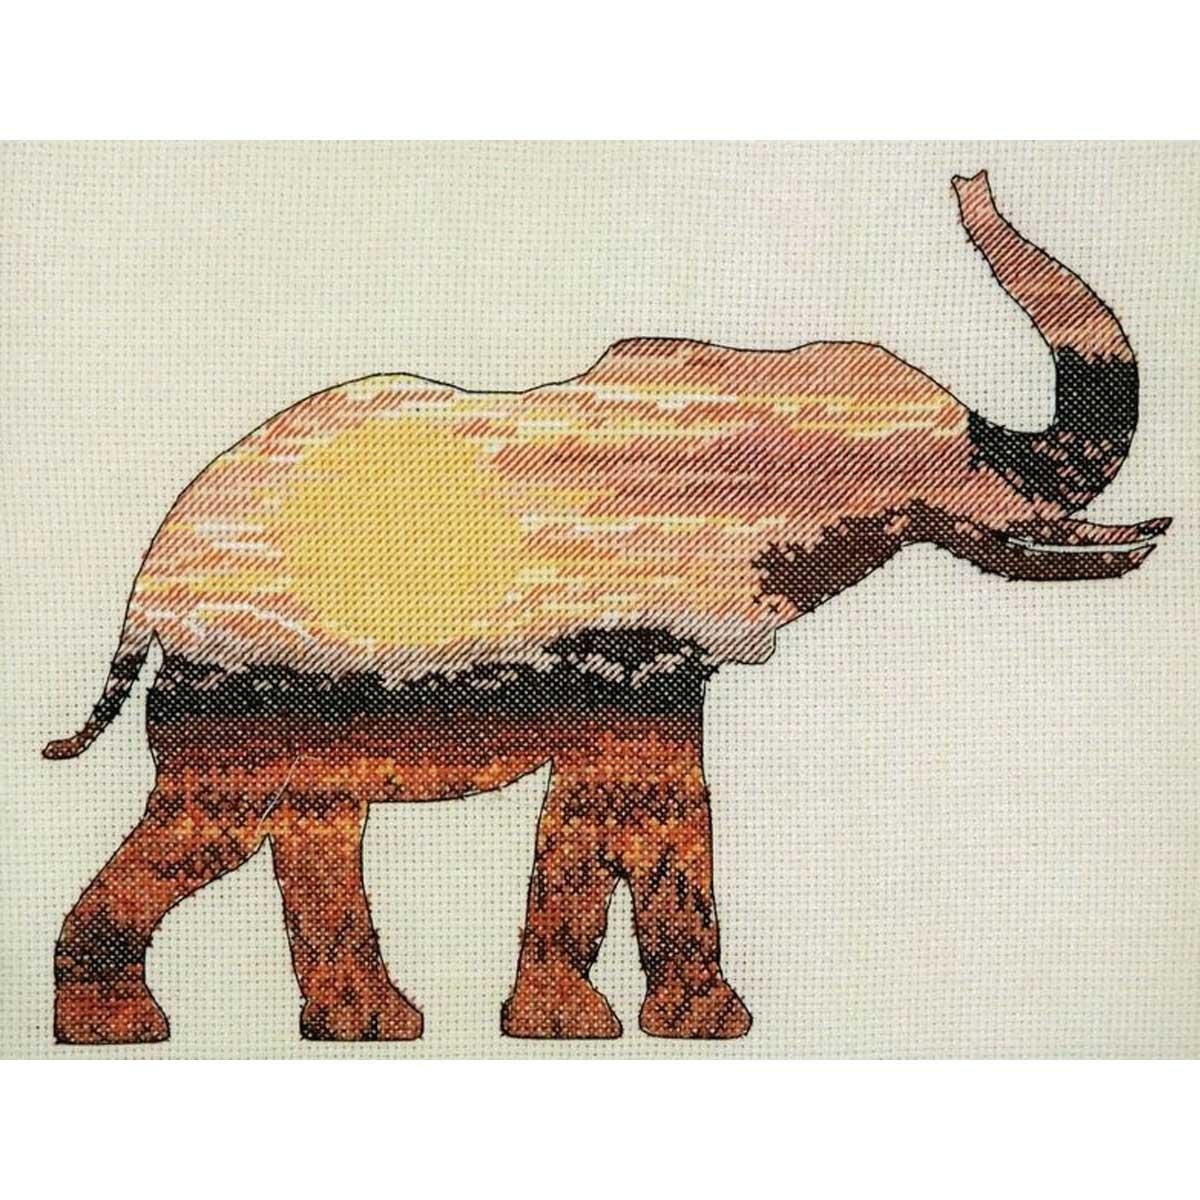 5678-5040 MAIA Набор для вышивания 'Слон в саванне' 20х26 см